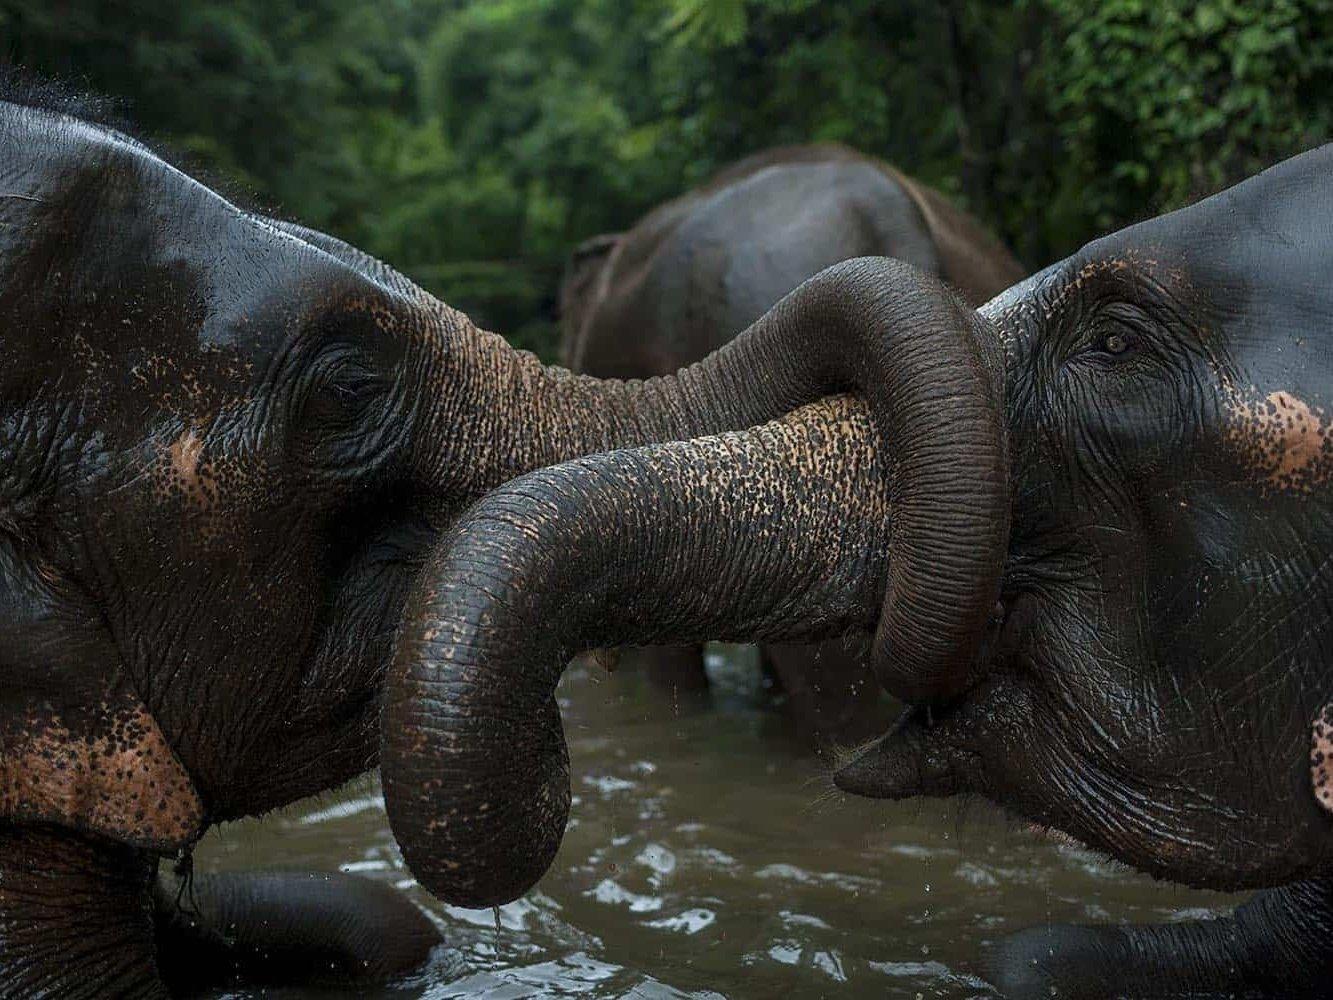 vietnam photographer mahout family binhdang 15